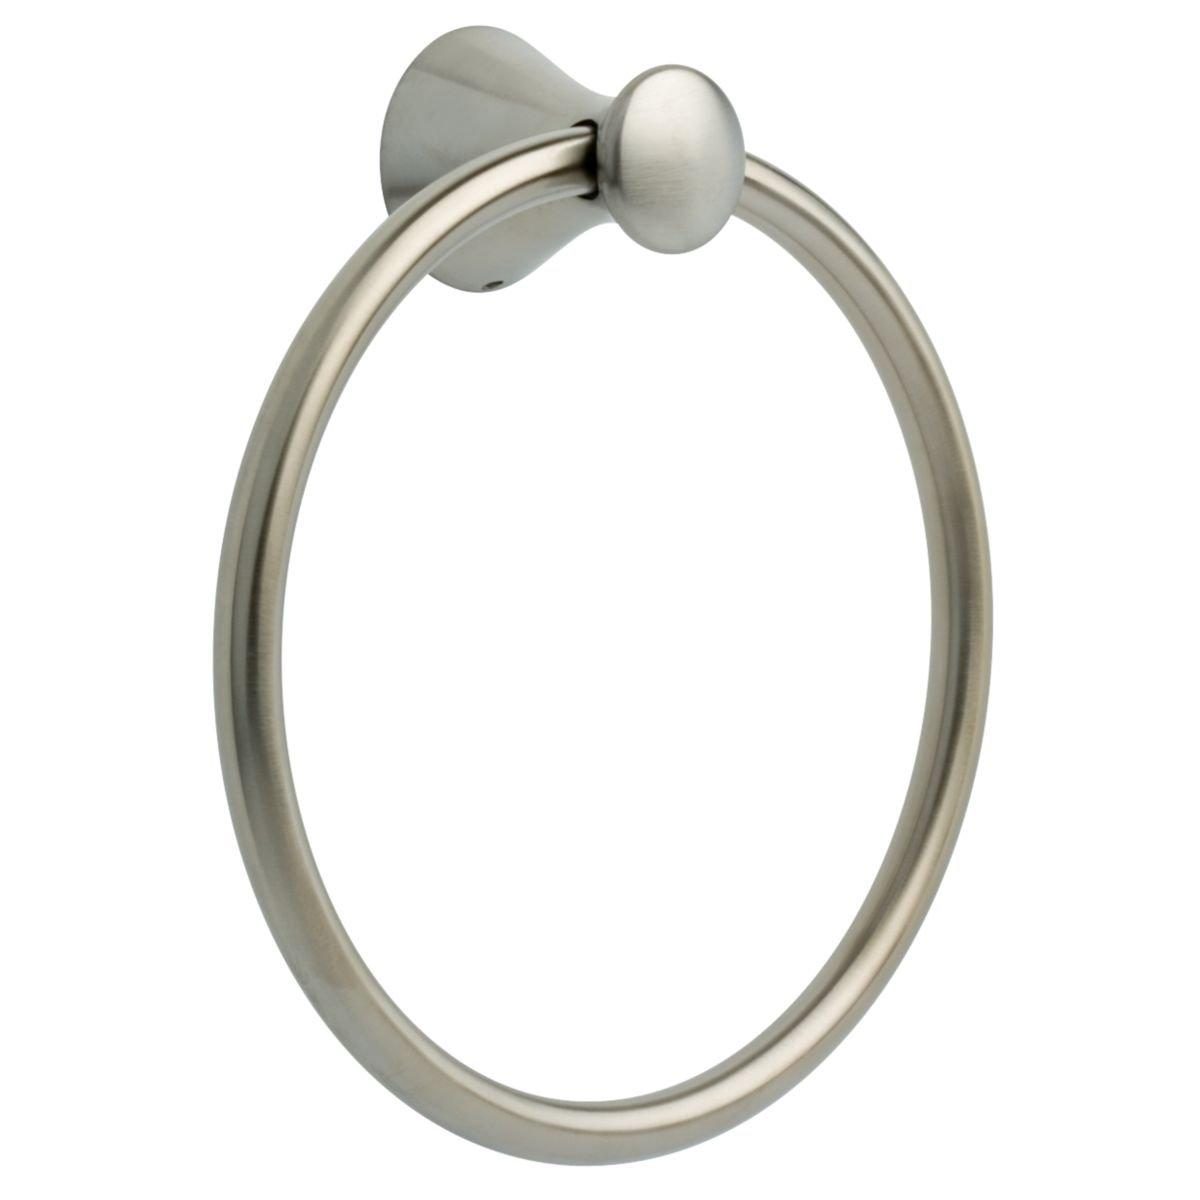 Franklin Brass Bath Accessories 139572 Somerset Bathroom Sets, Hand Towel Ring, Satin Nickel